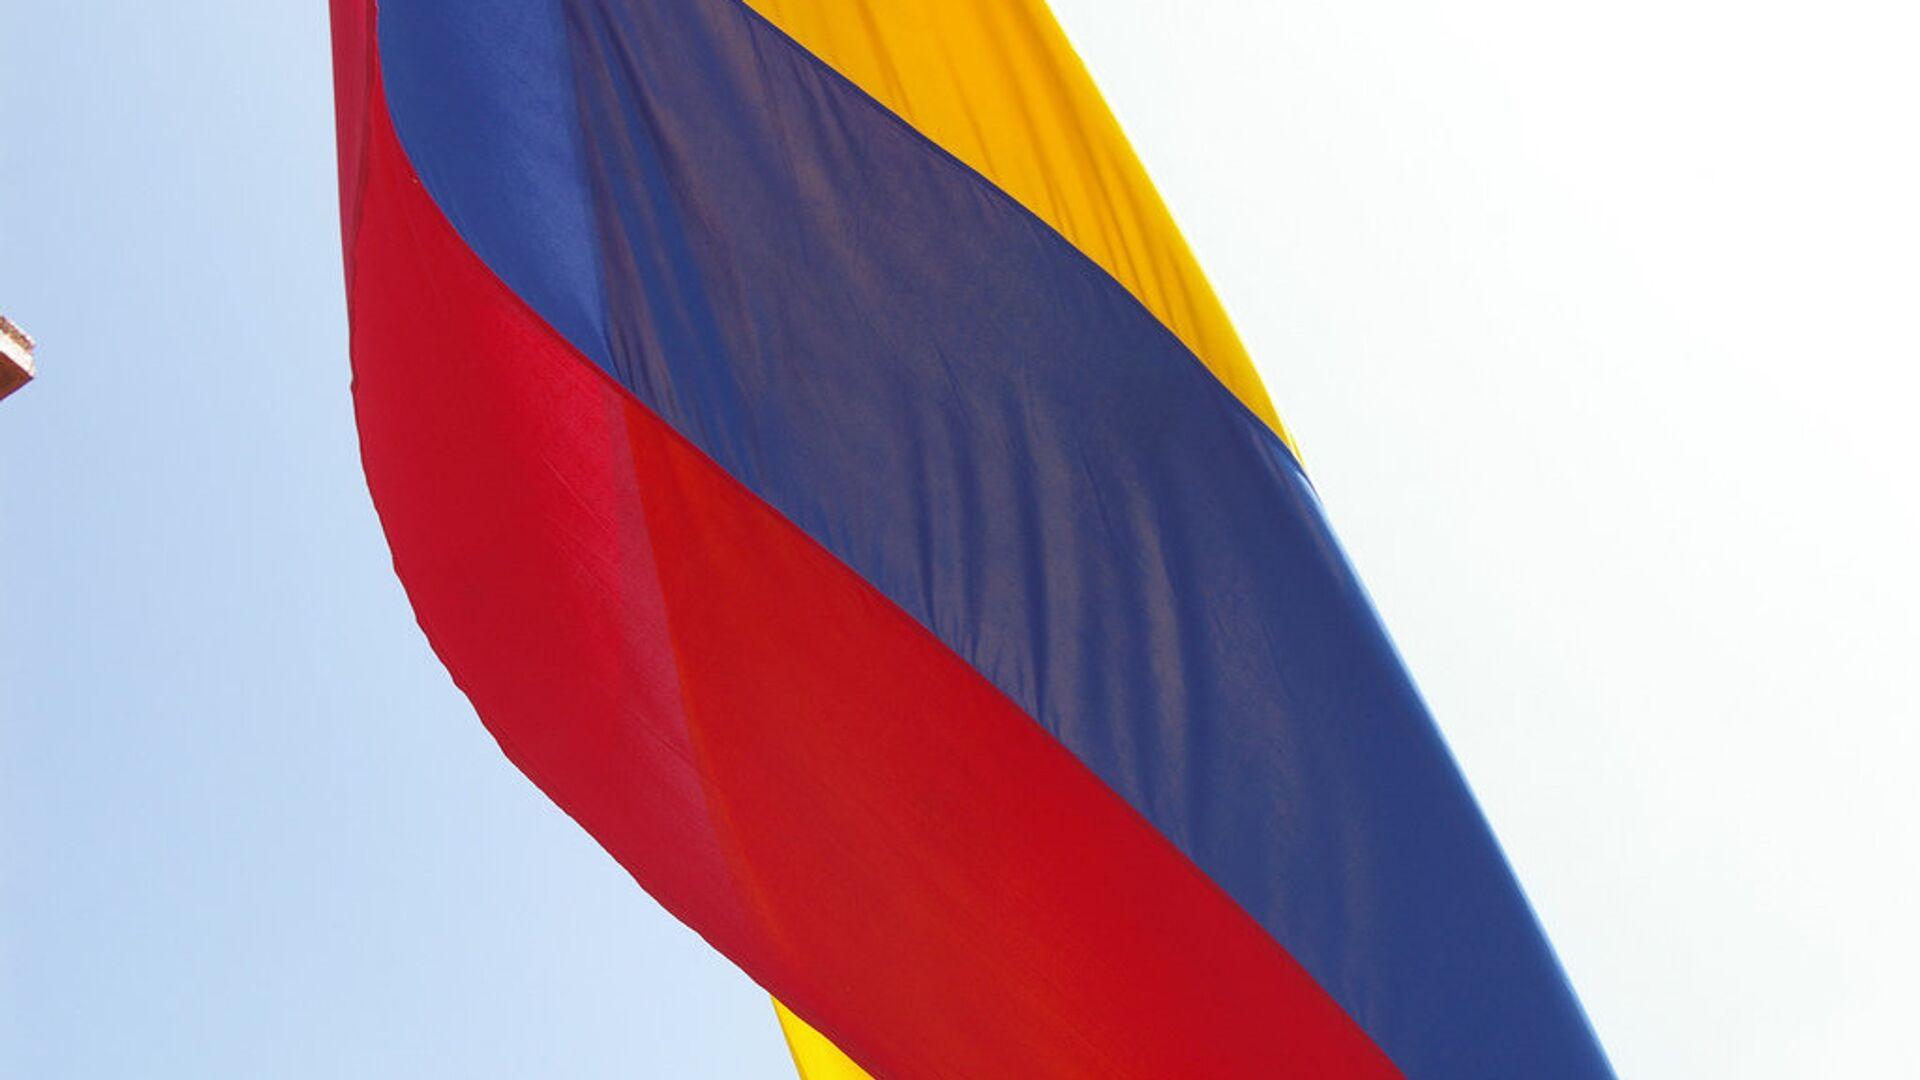 Bandera de Colombia - Sputnik Mundo, 1920, 20.04.2021